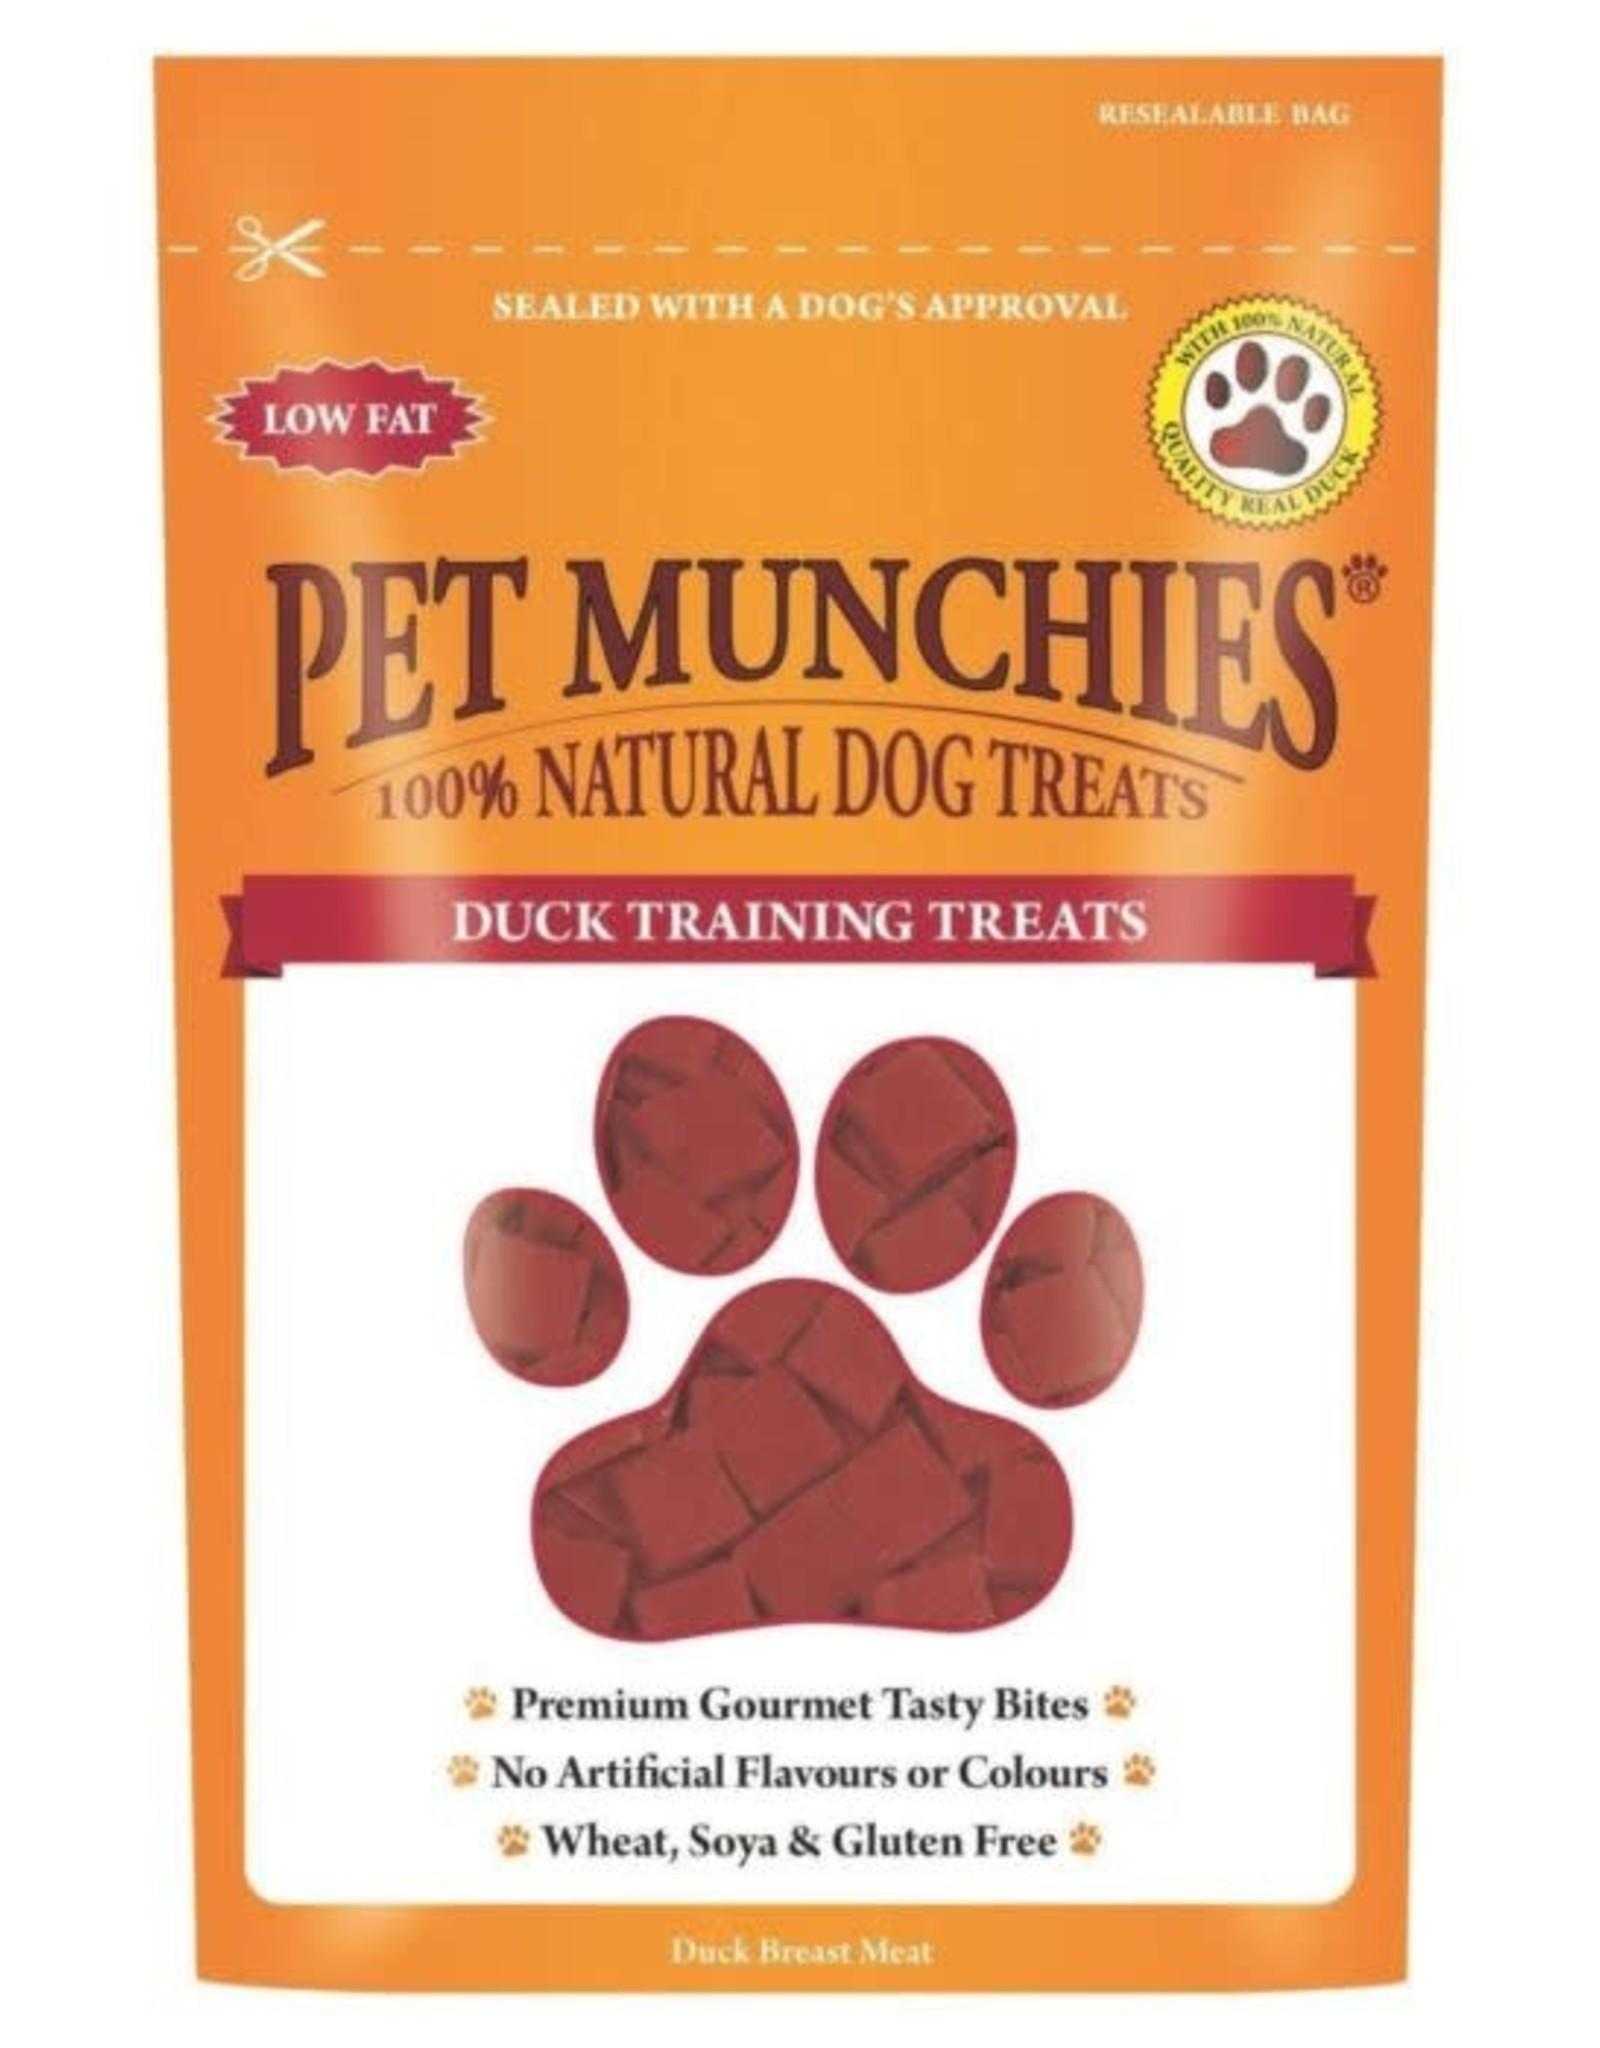 Pet Munchies Duck Training Treats 100% Natural Dog Treats, 50g